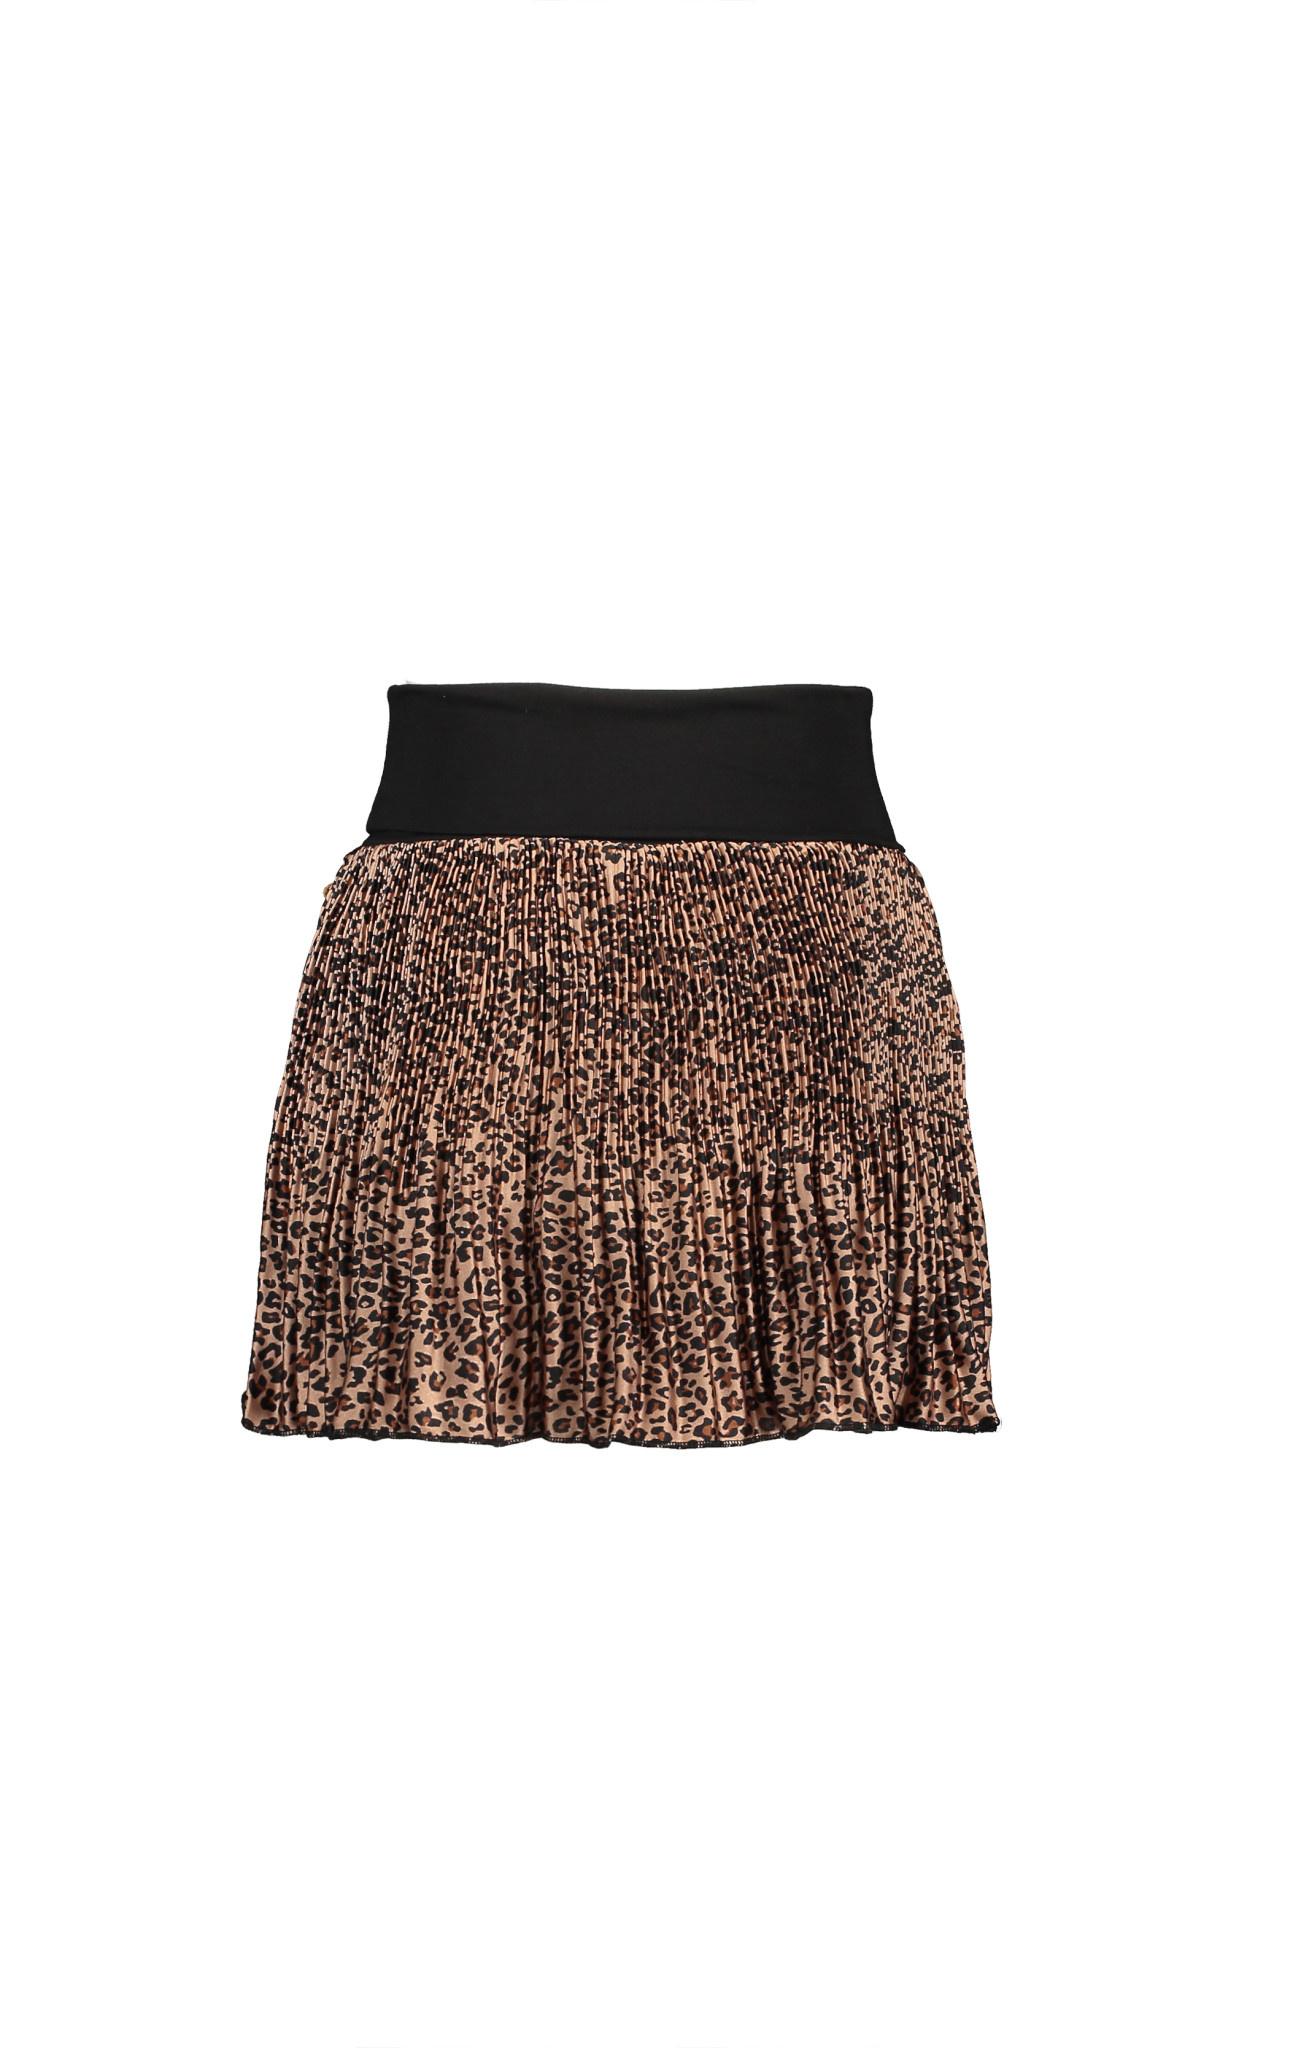 Naly Plisse Skirt